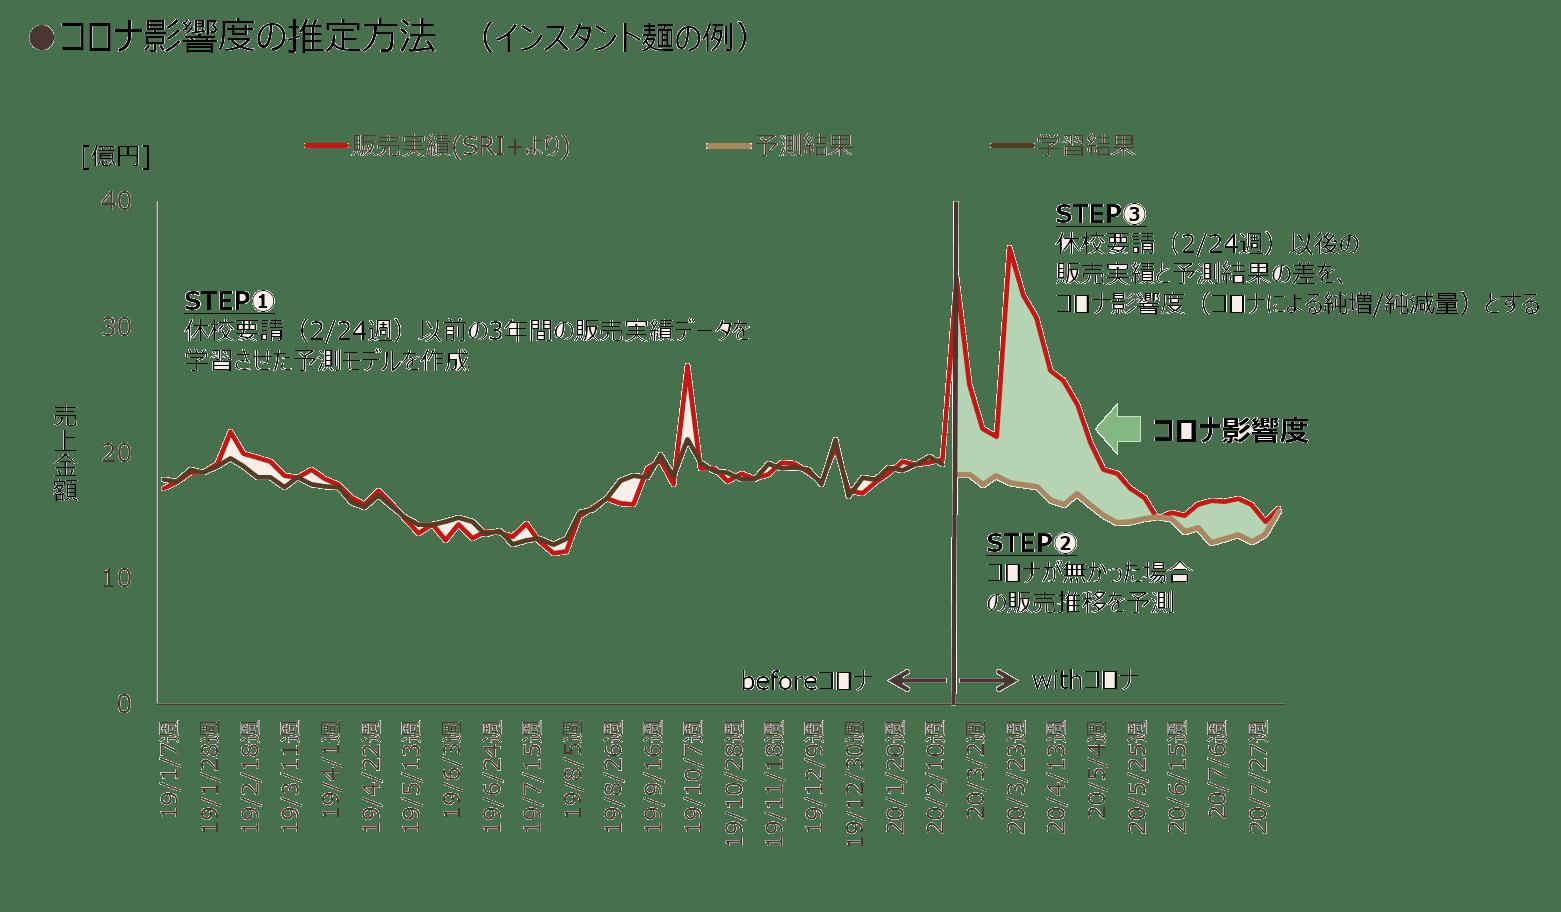 demand-forecast_01.png